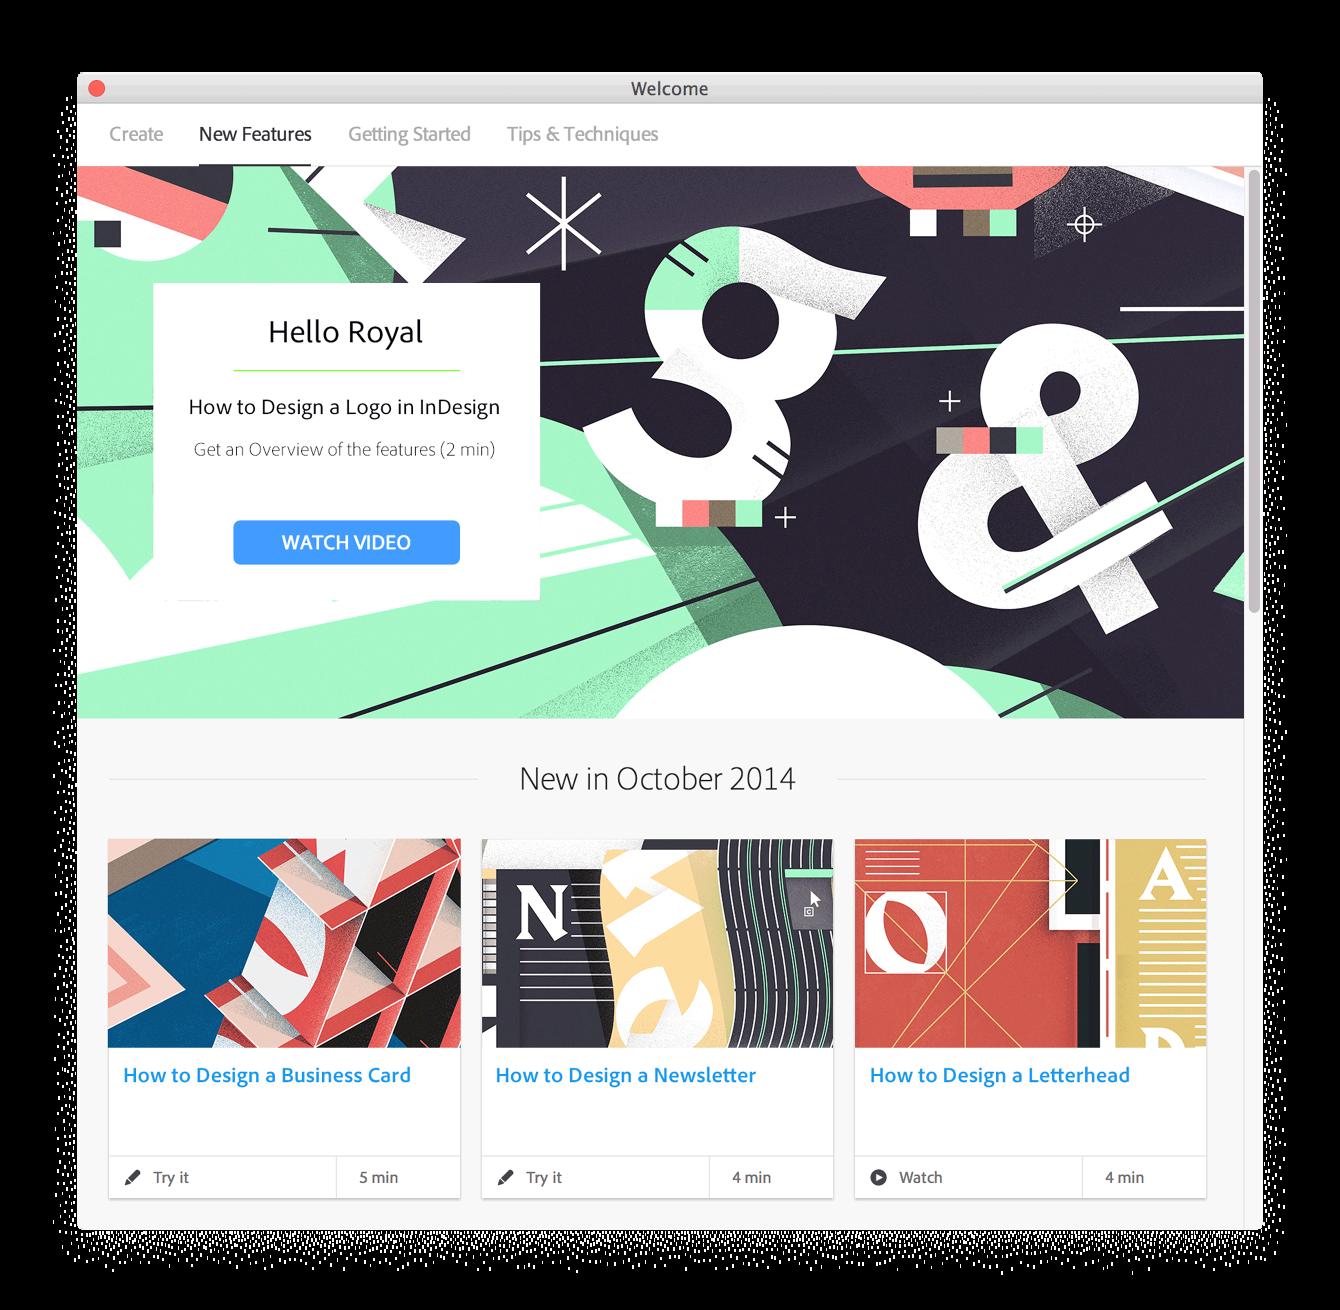 Adobe Creative Cloud - The Royal Studio